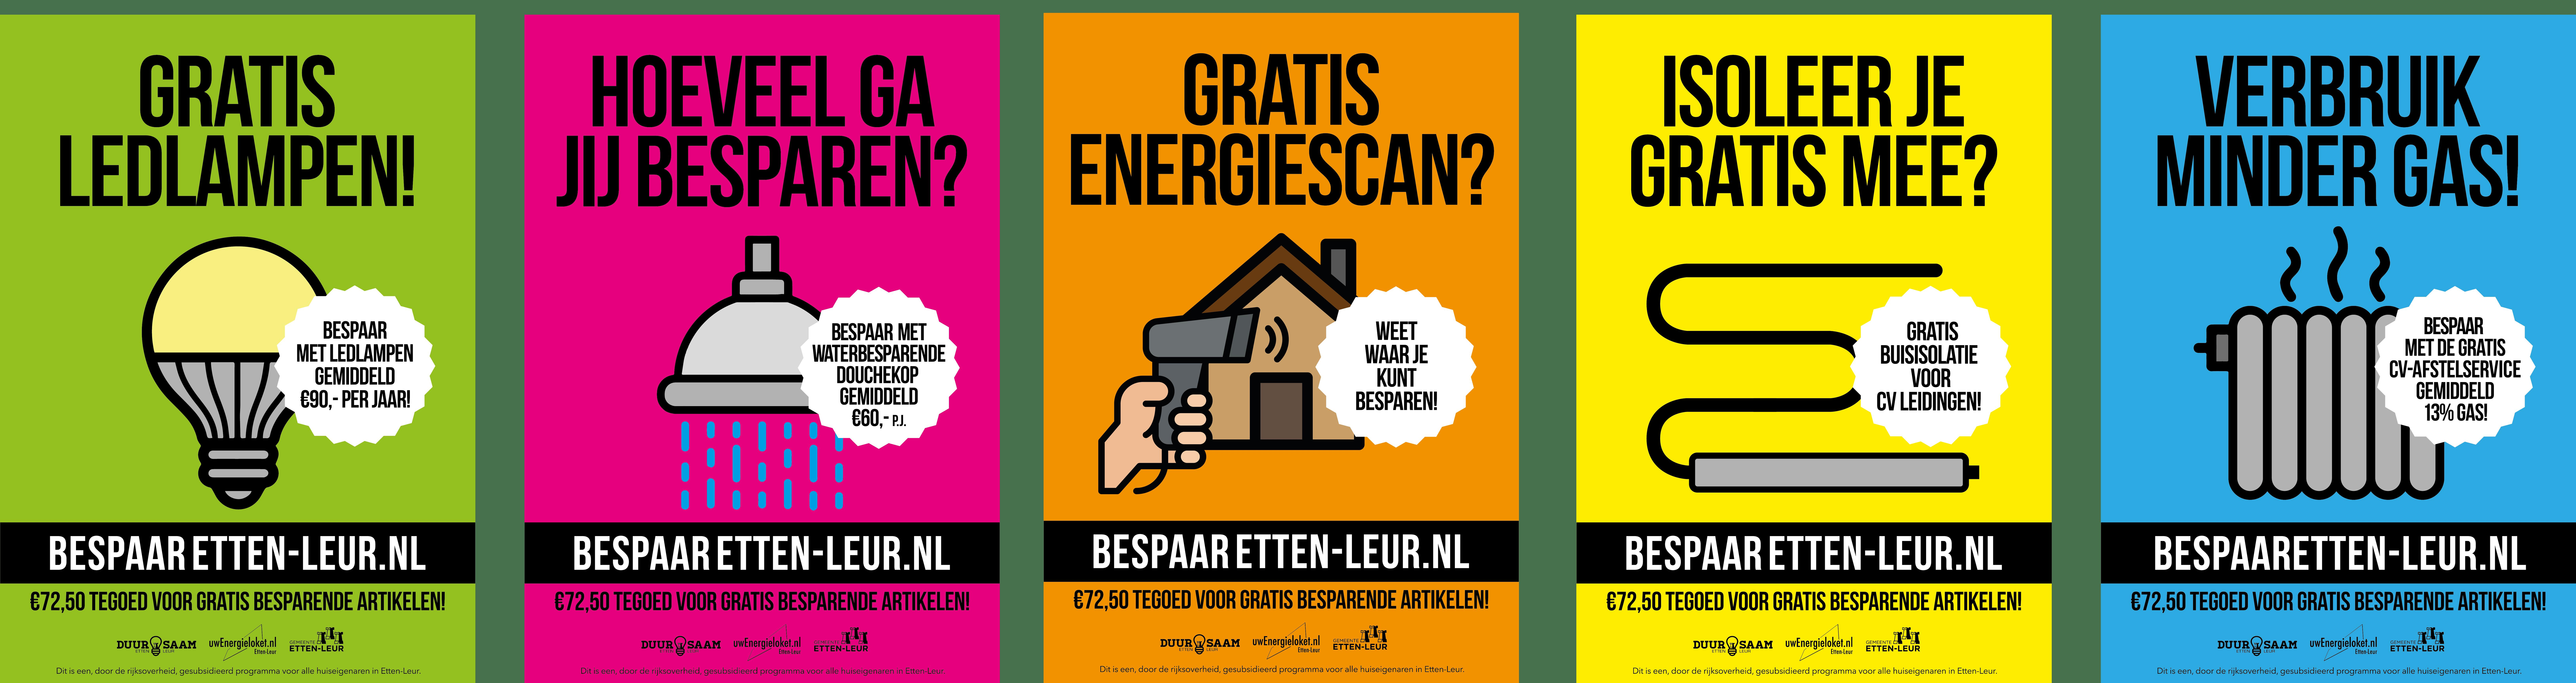 posters-BespaarEtten-Leur